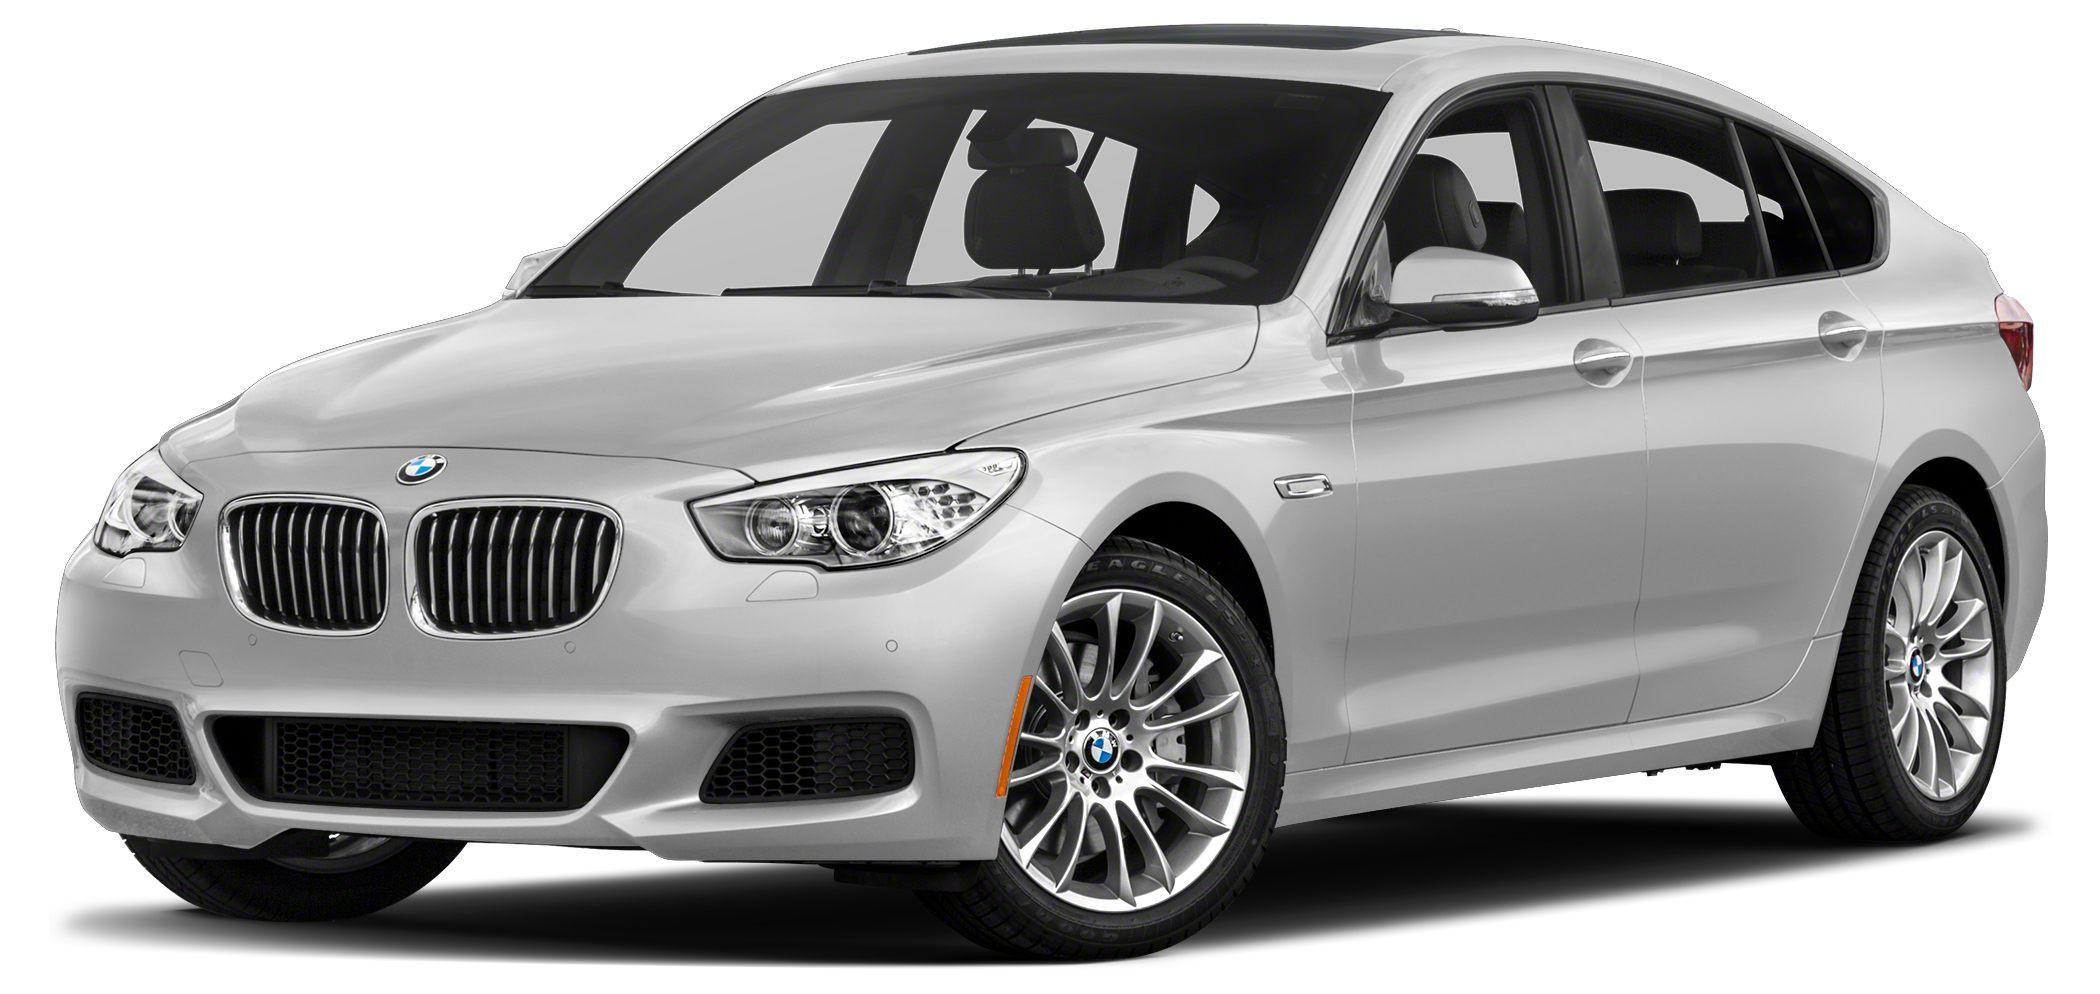 2014 BMW 550 Gran Turismo Exterior